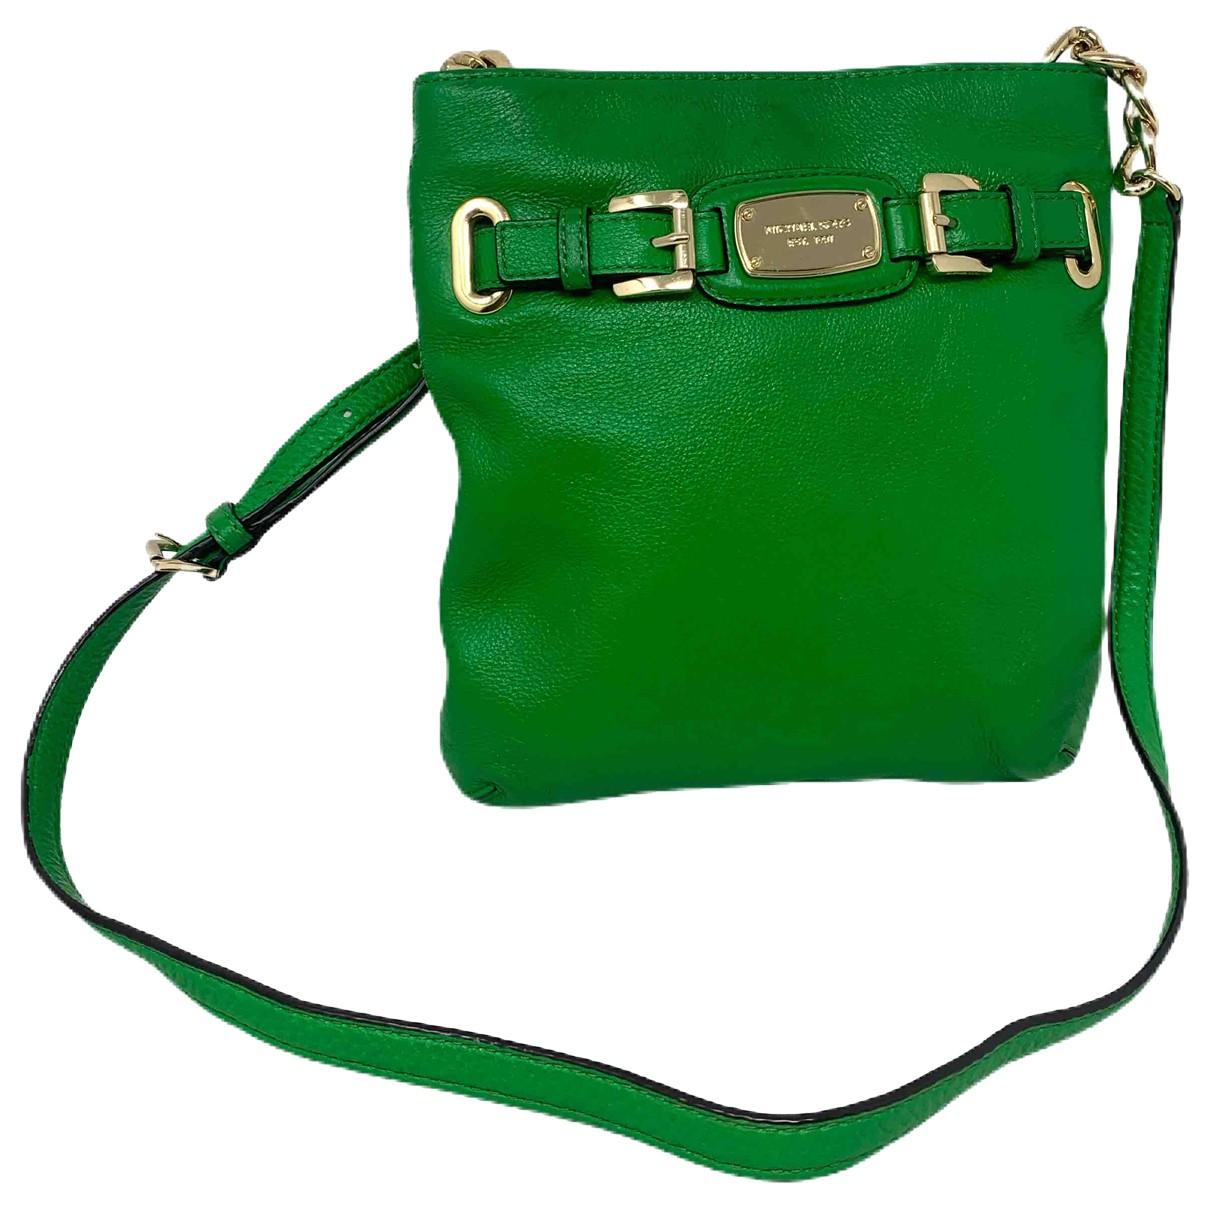 Michael Kors - Sac a main   pour femme en cuir - vert